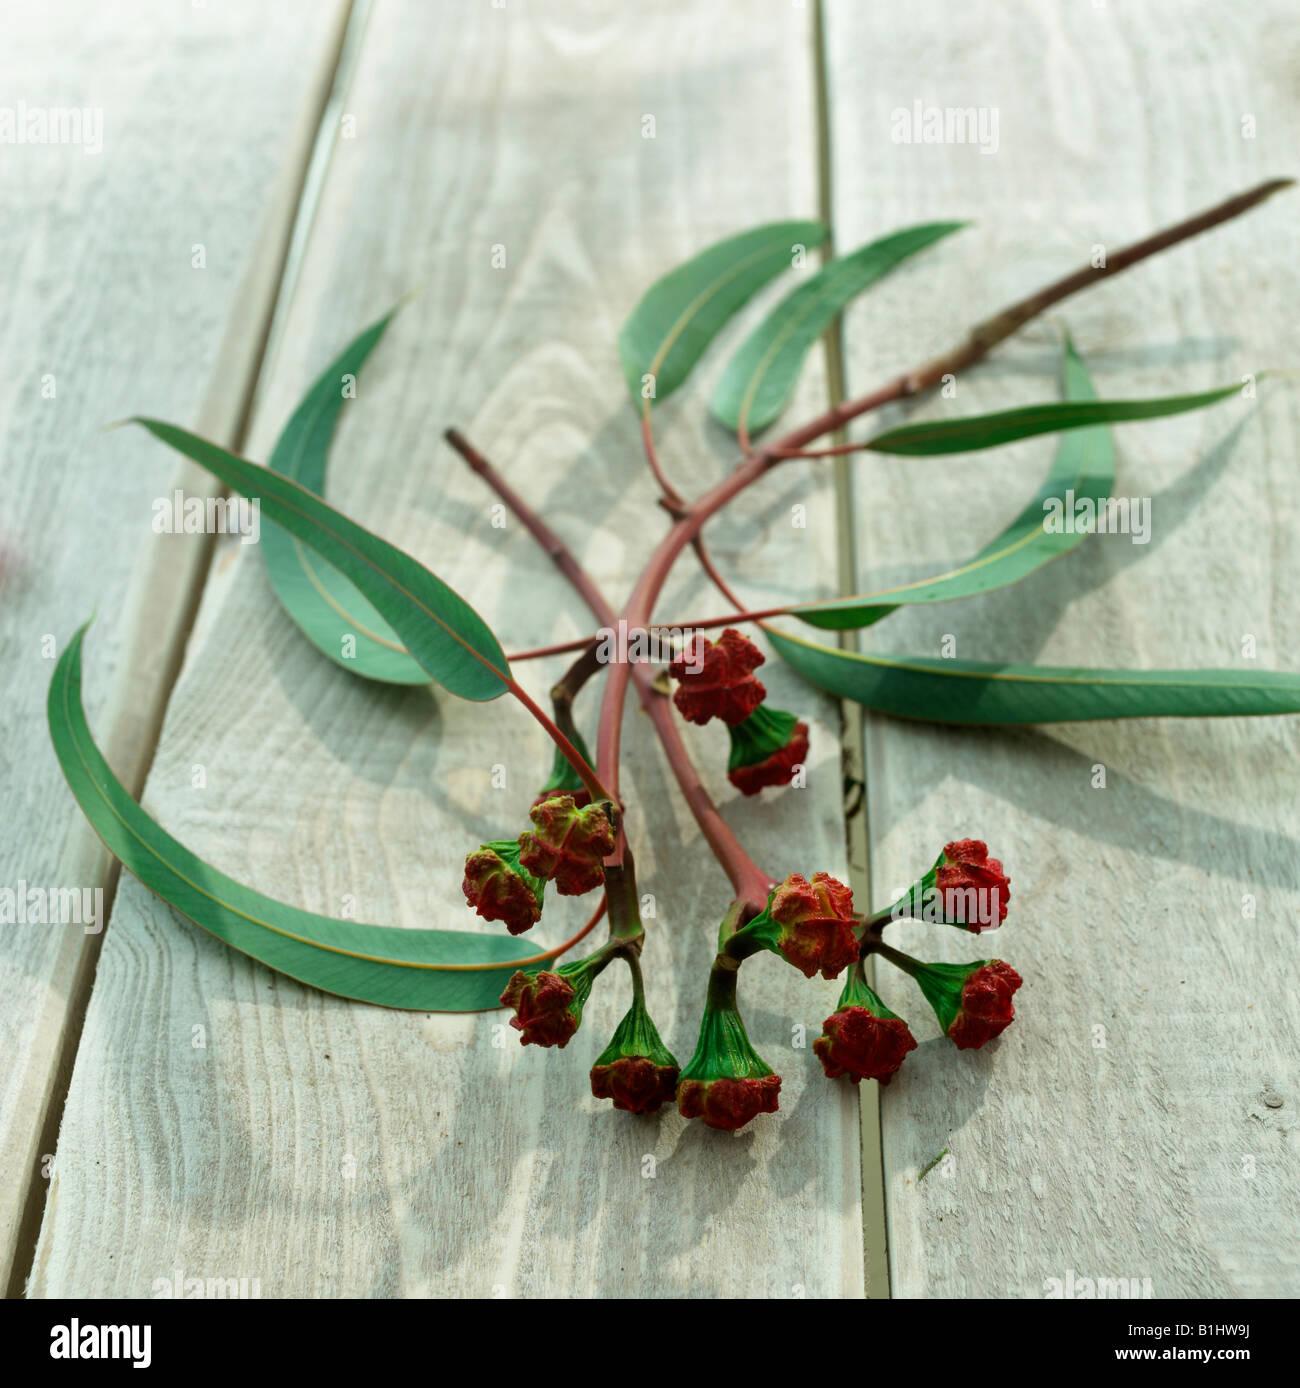 Eucalyptus twig with buds - Stock Image